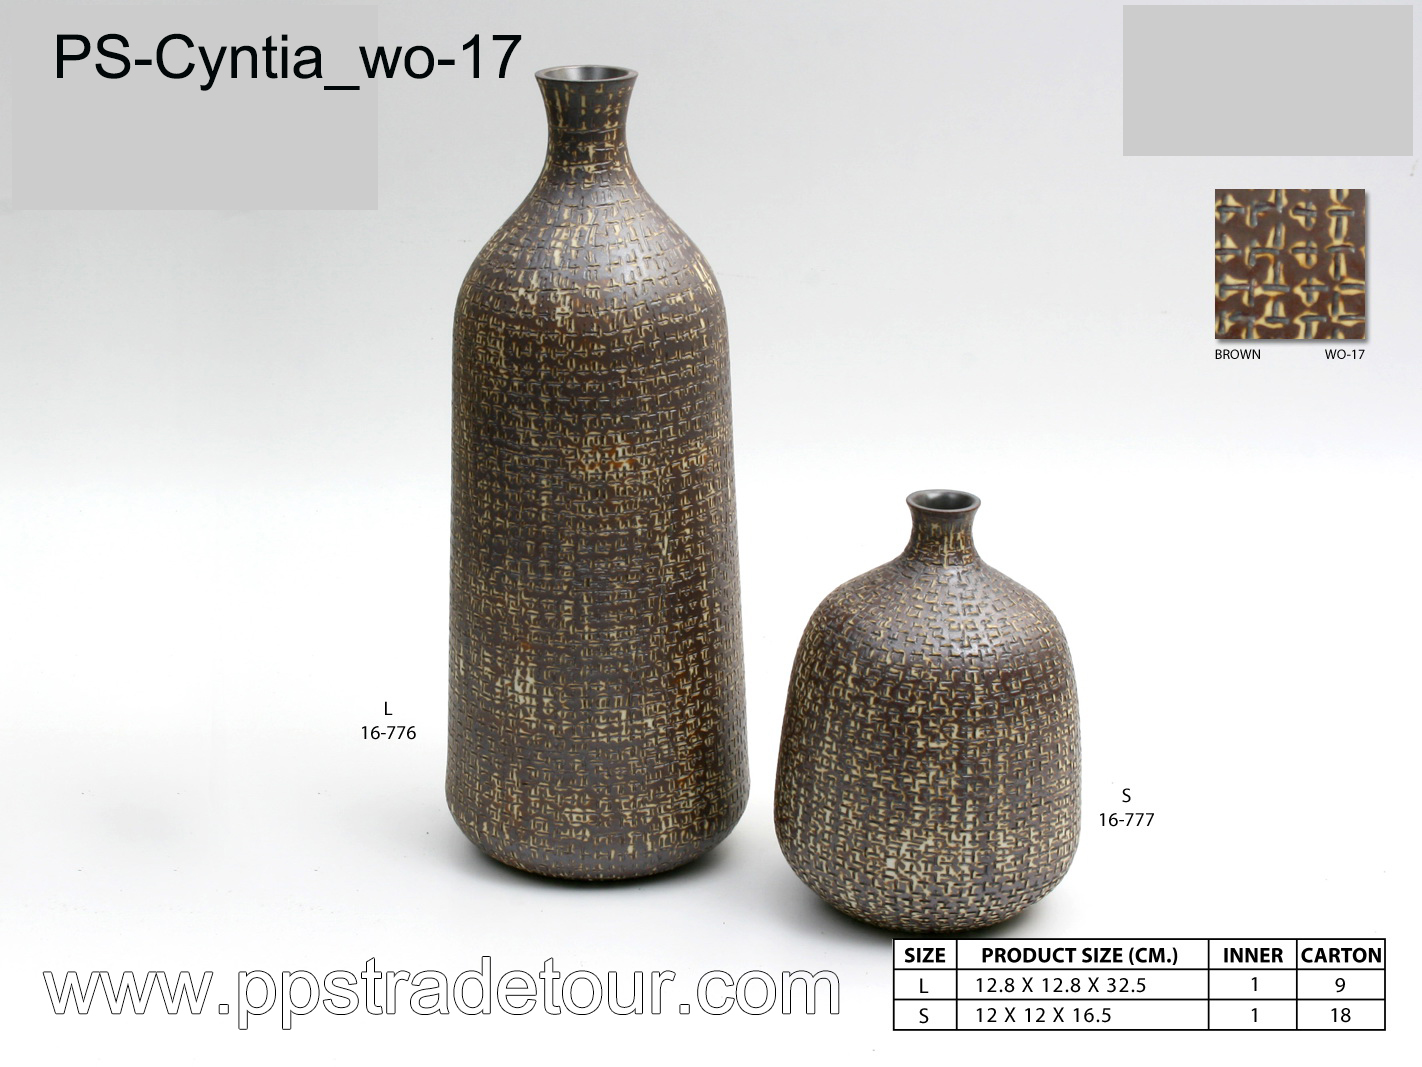 PSCV-Cyntia_wo-17